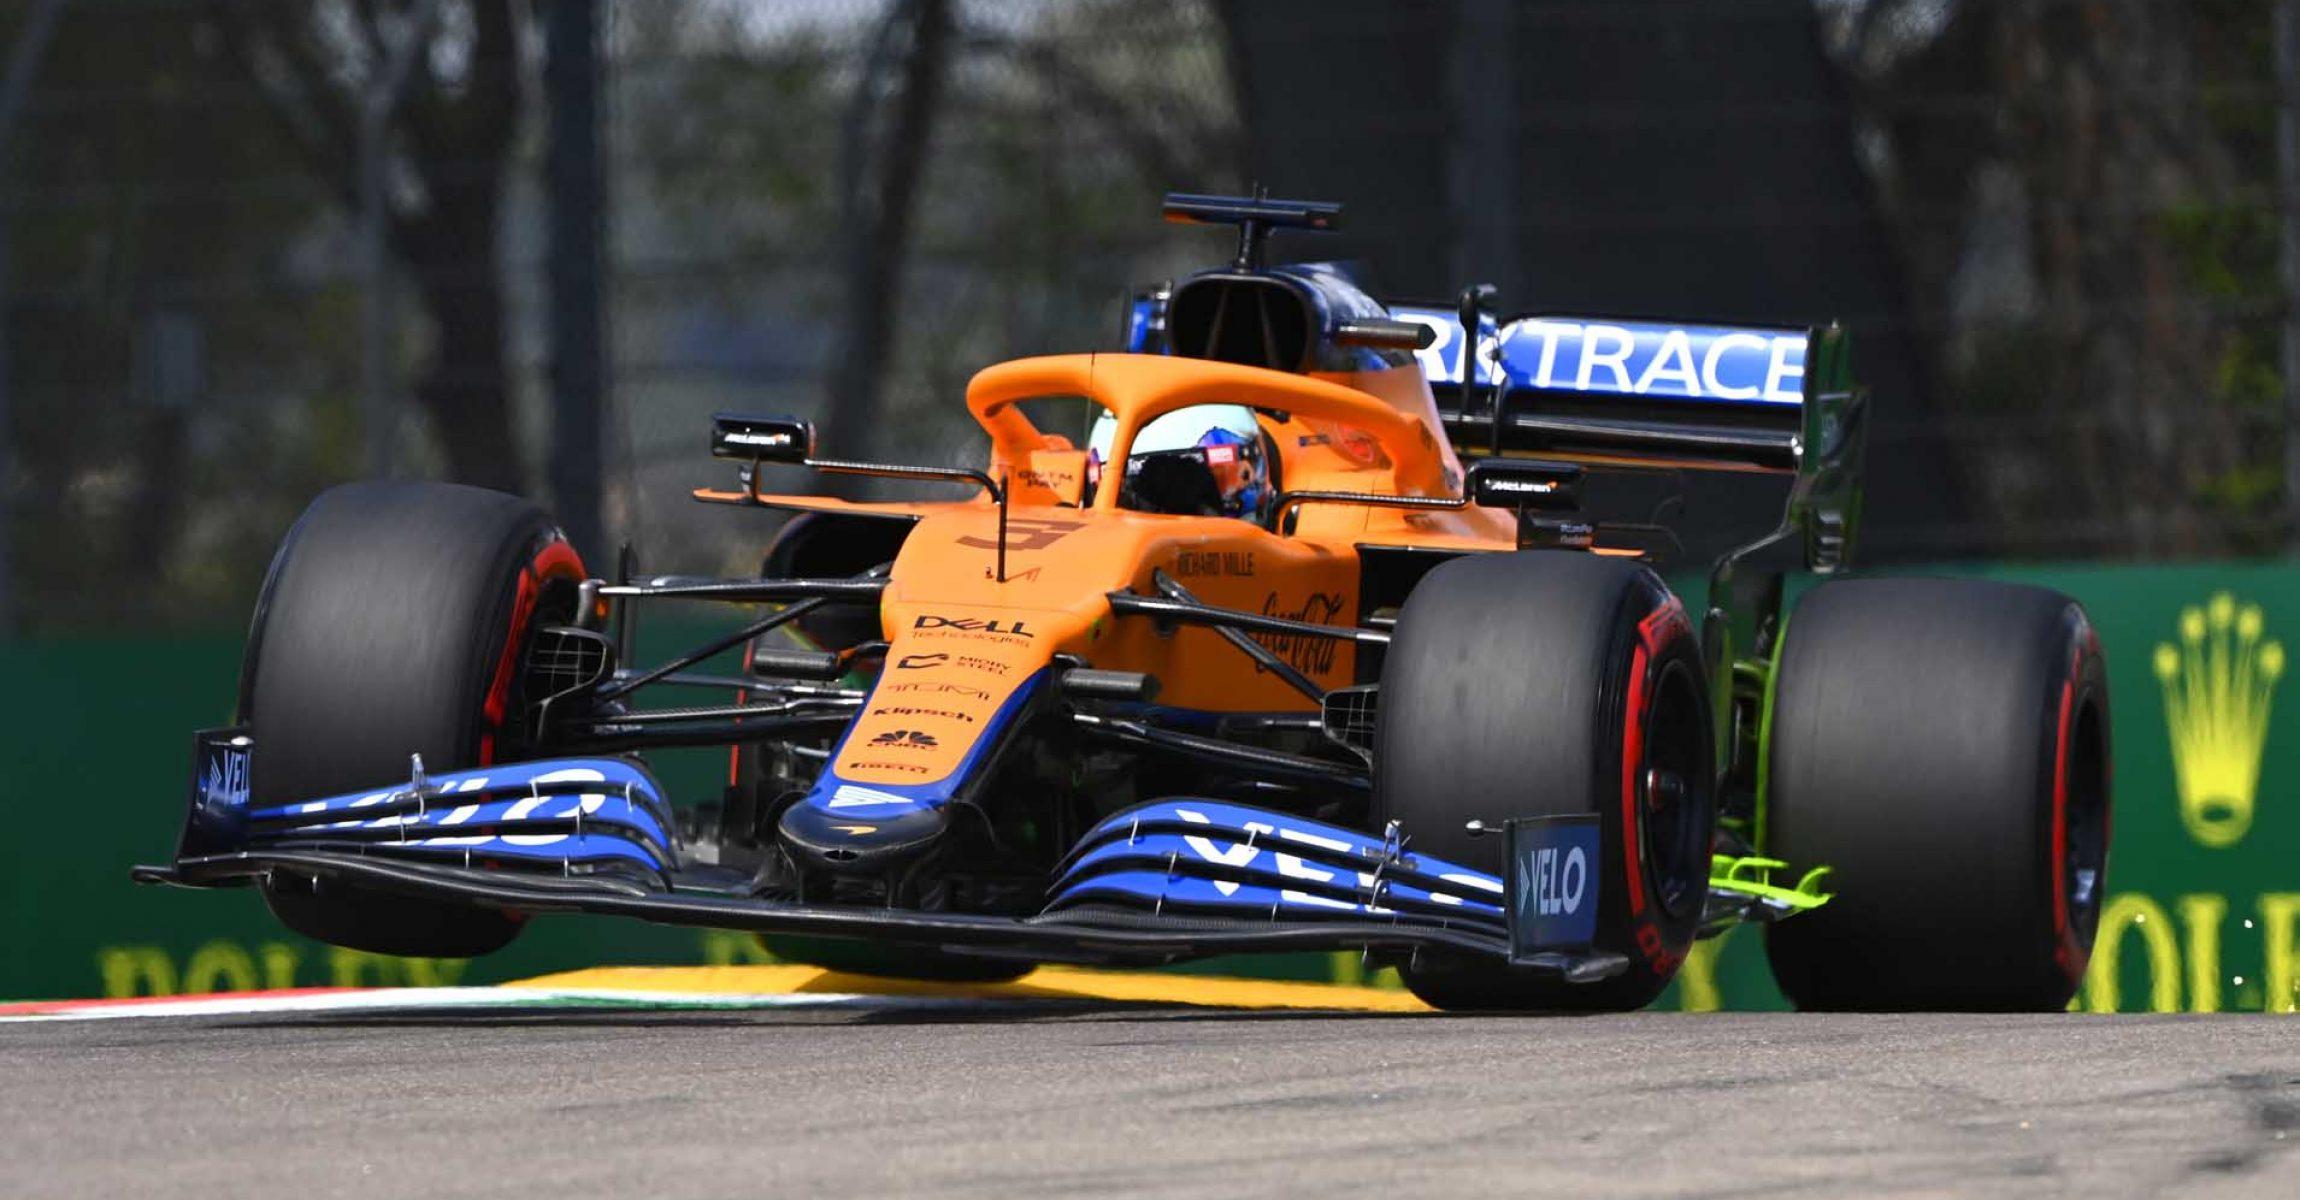 Daniel Ricciardo, McLaren MCL35M, car front on at turn